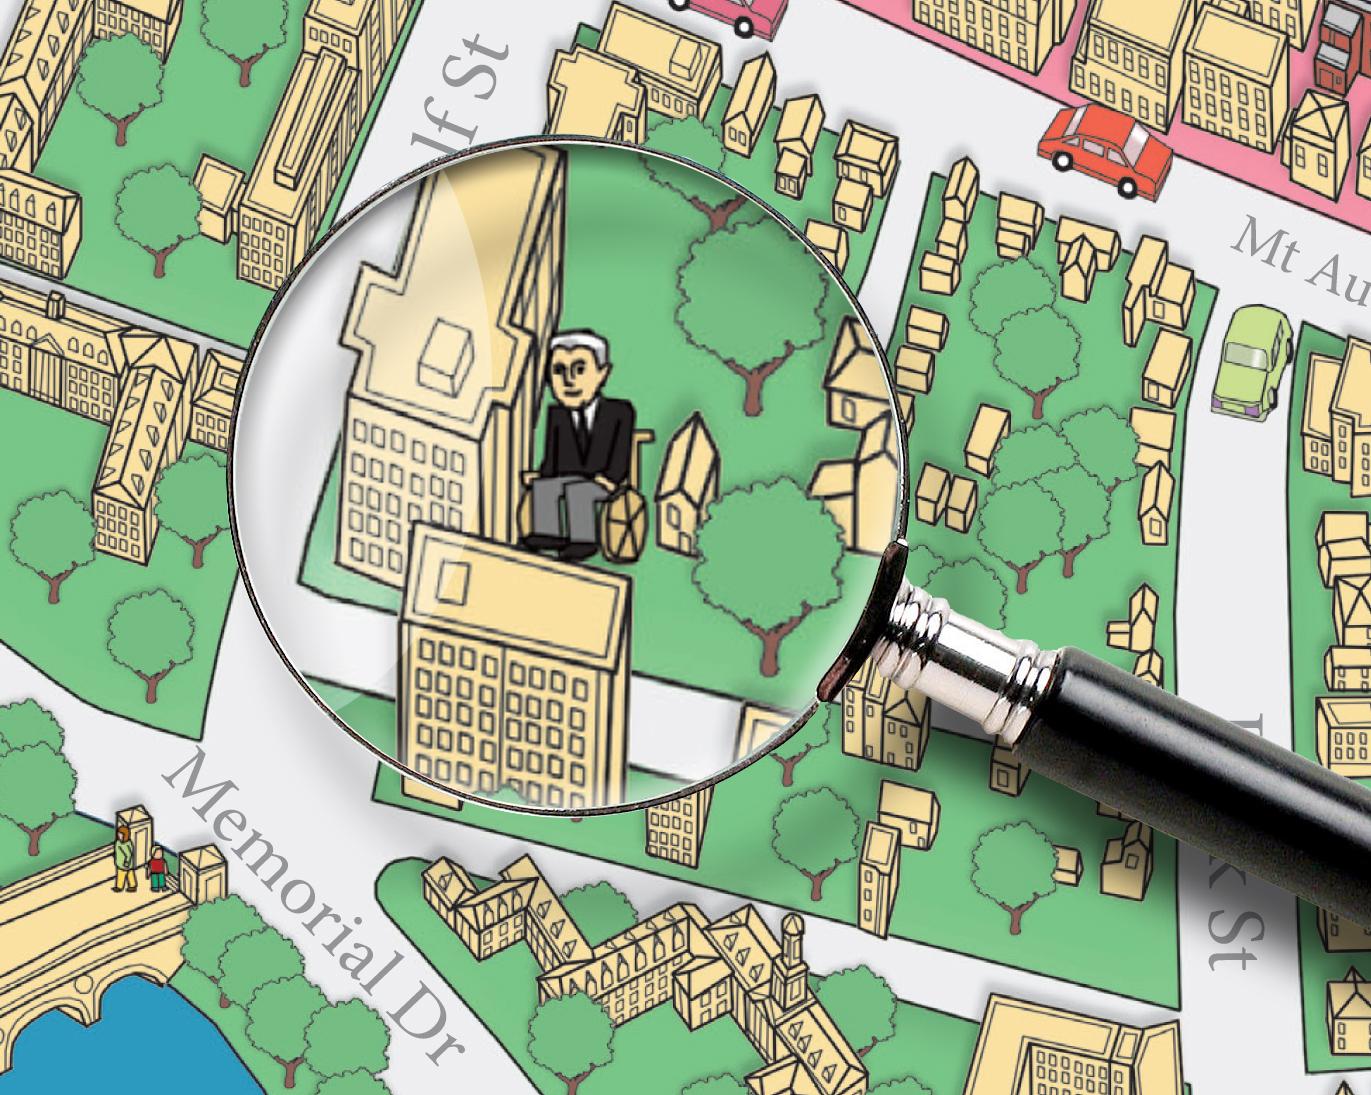 Maps | Michael McVey, Skiffleboom